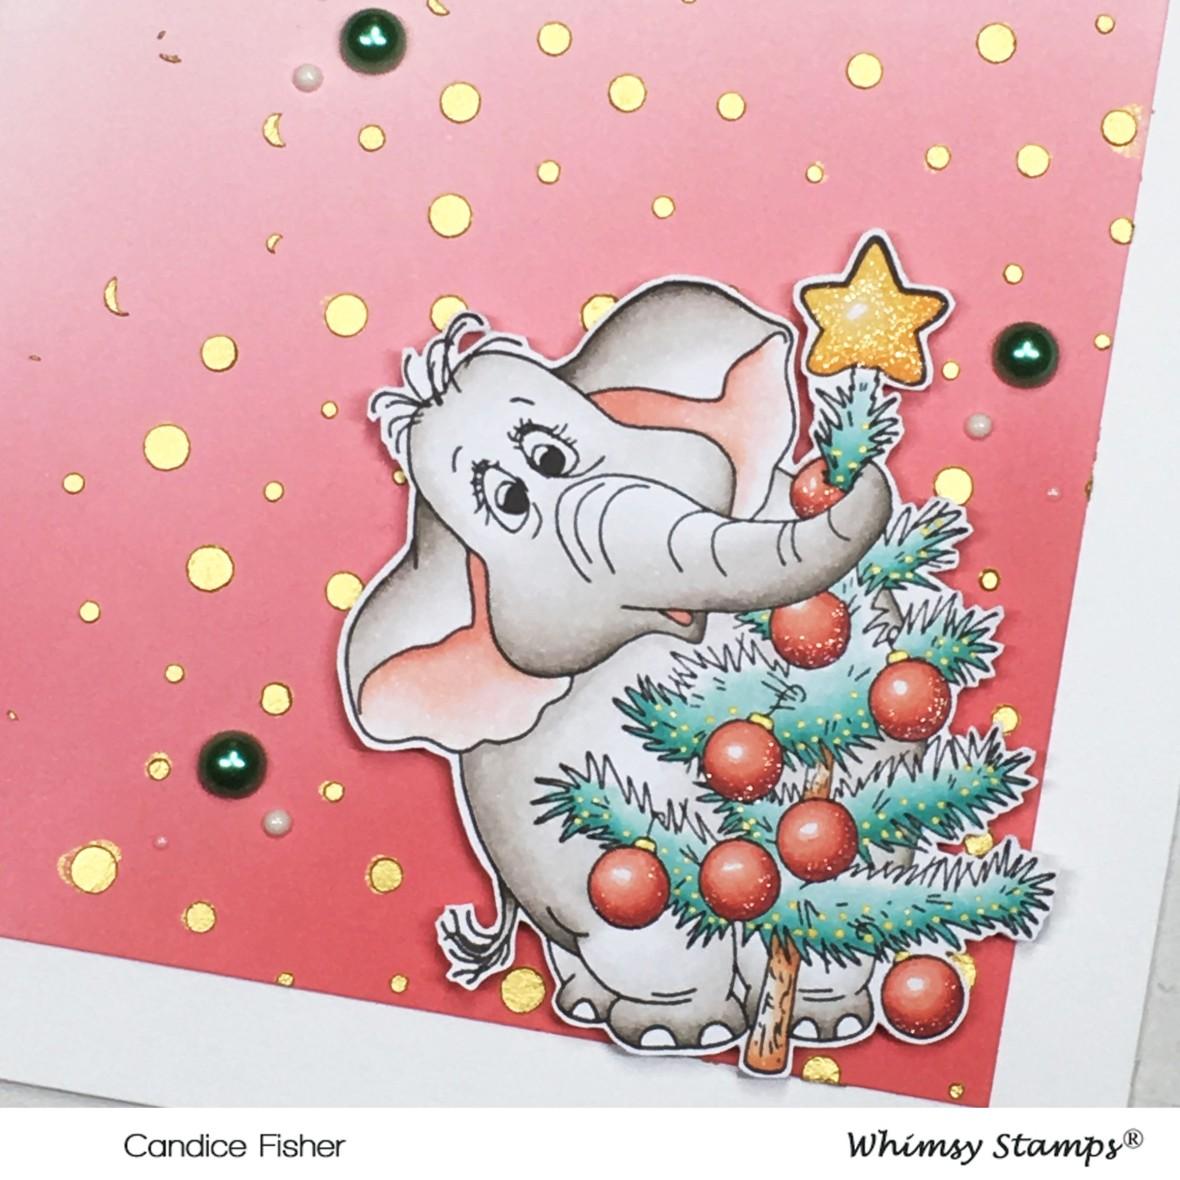 1006-dr. suess elephant close up